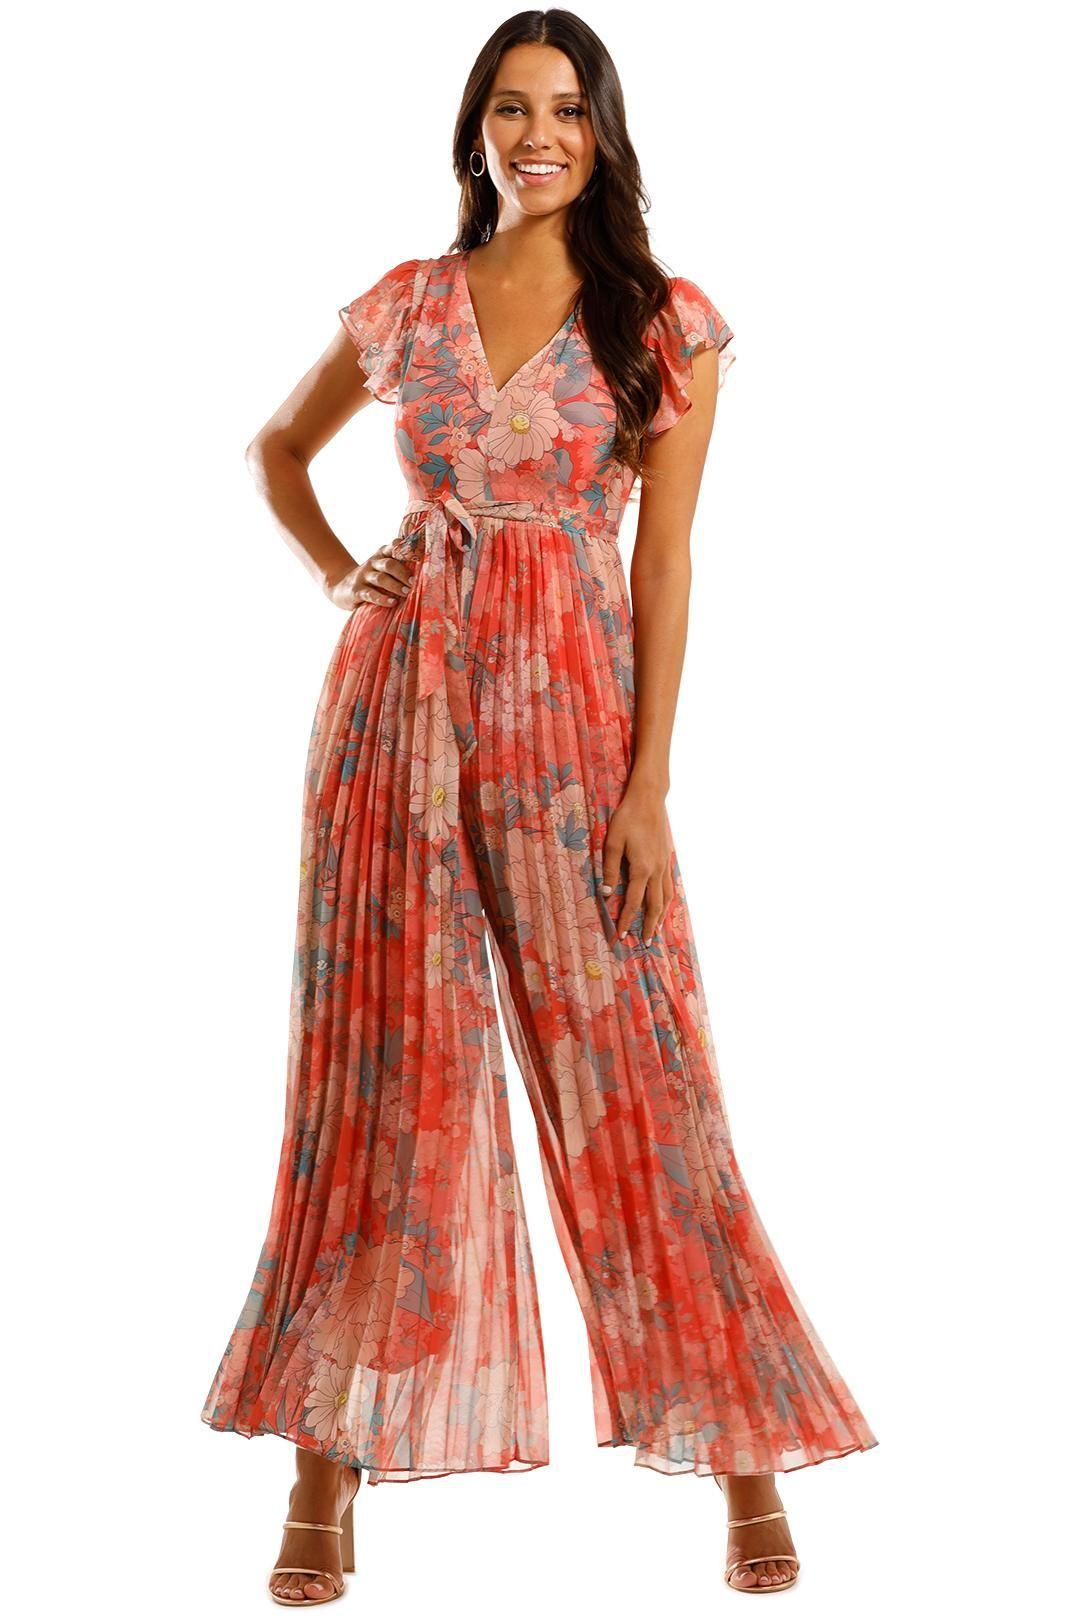 Kachel Annmarie Ruffled Pleated Floral Jumpsuit Boho